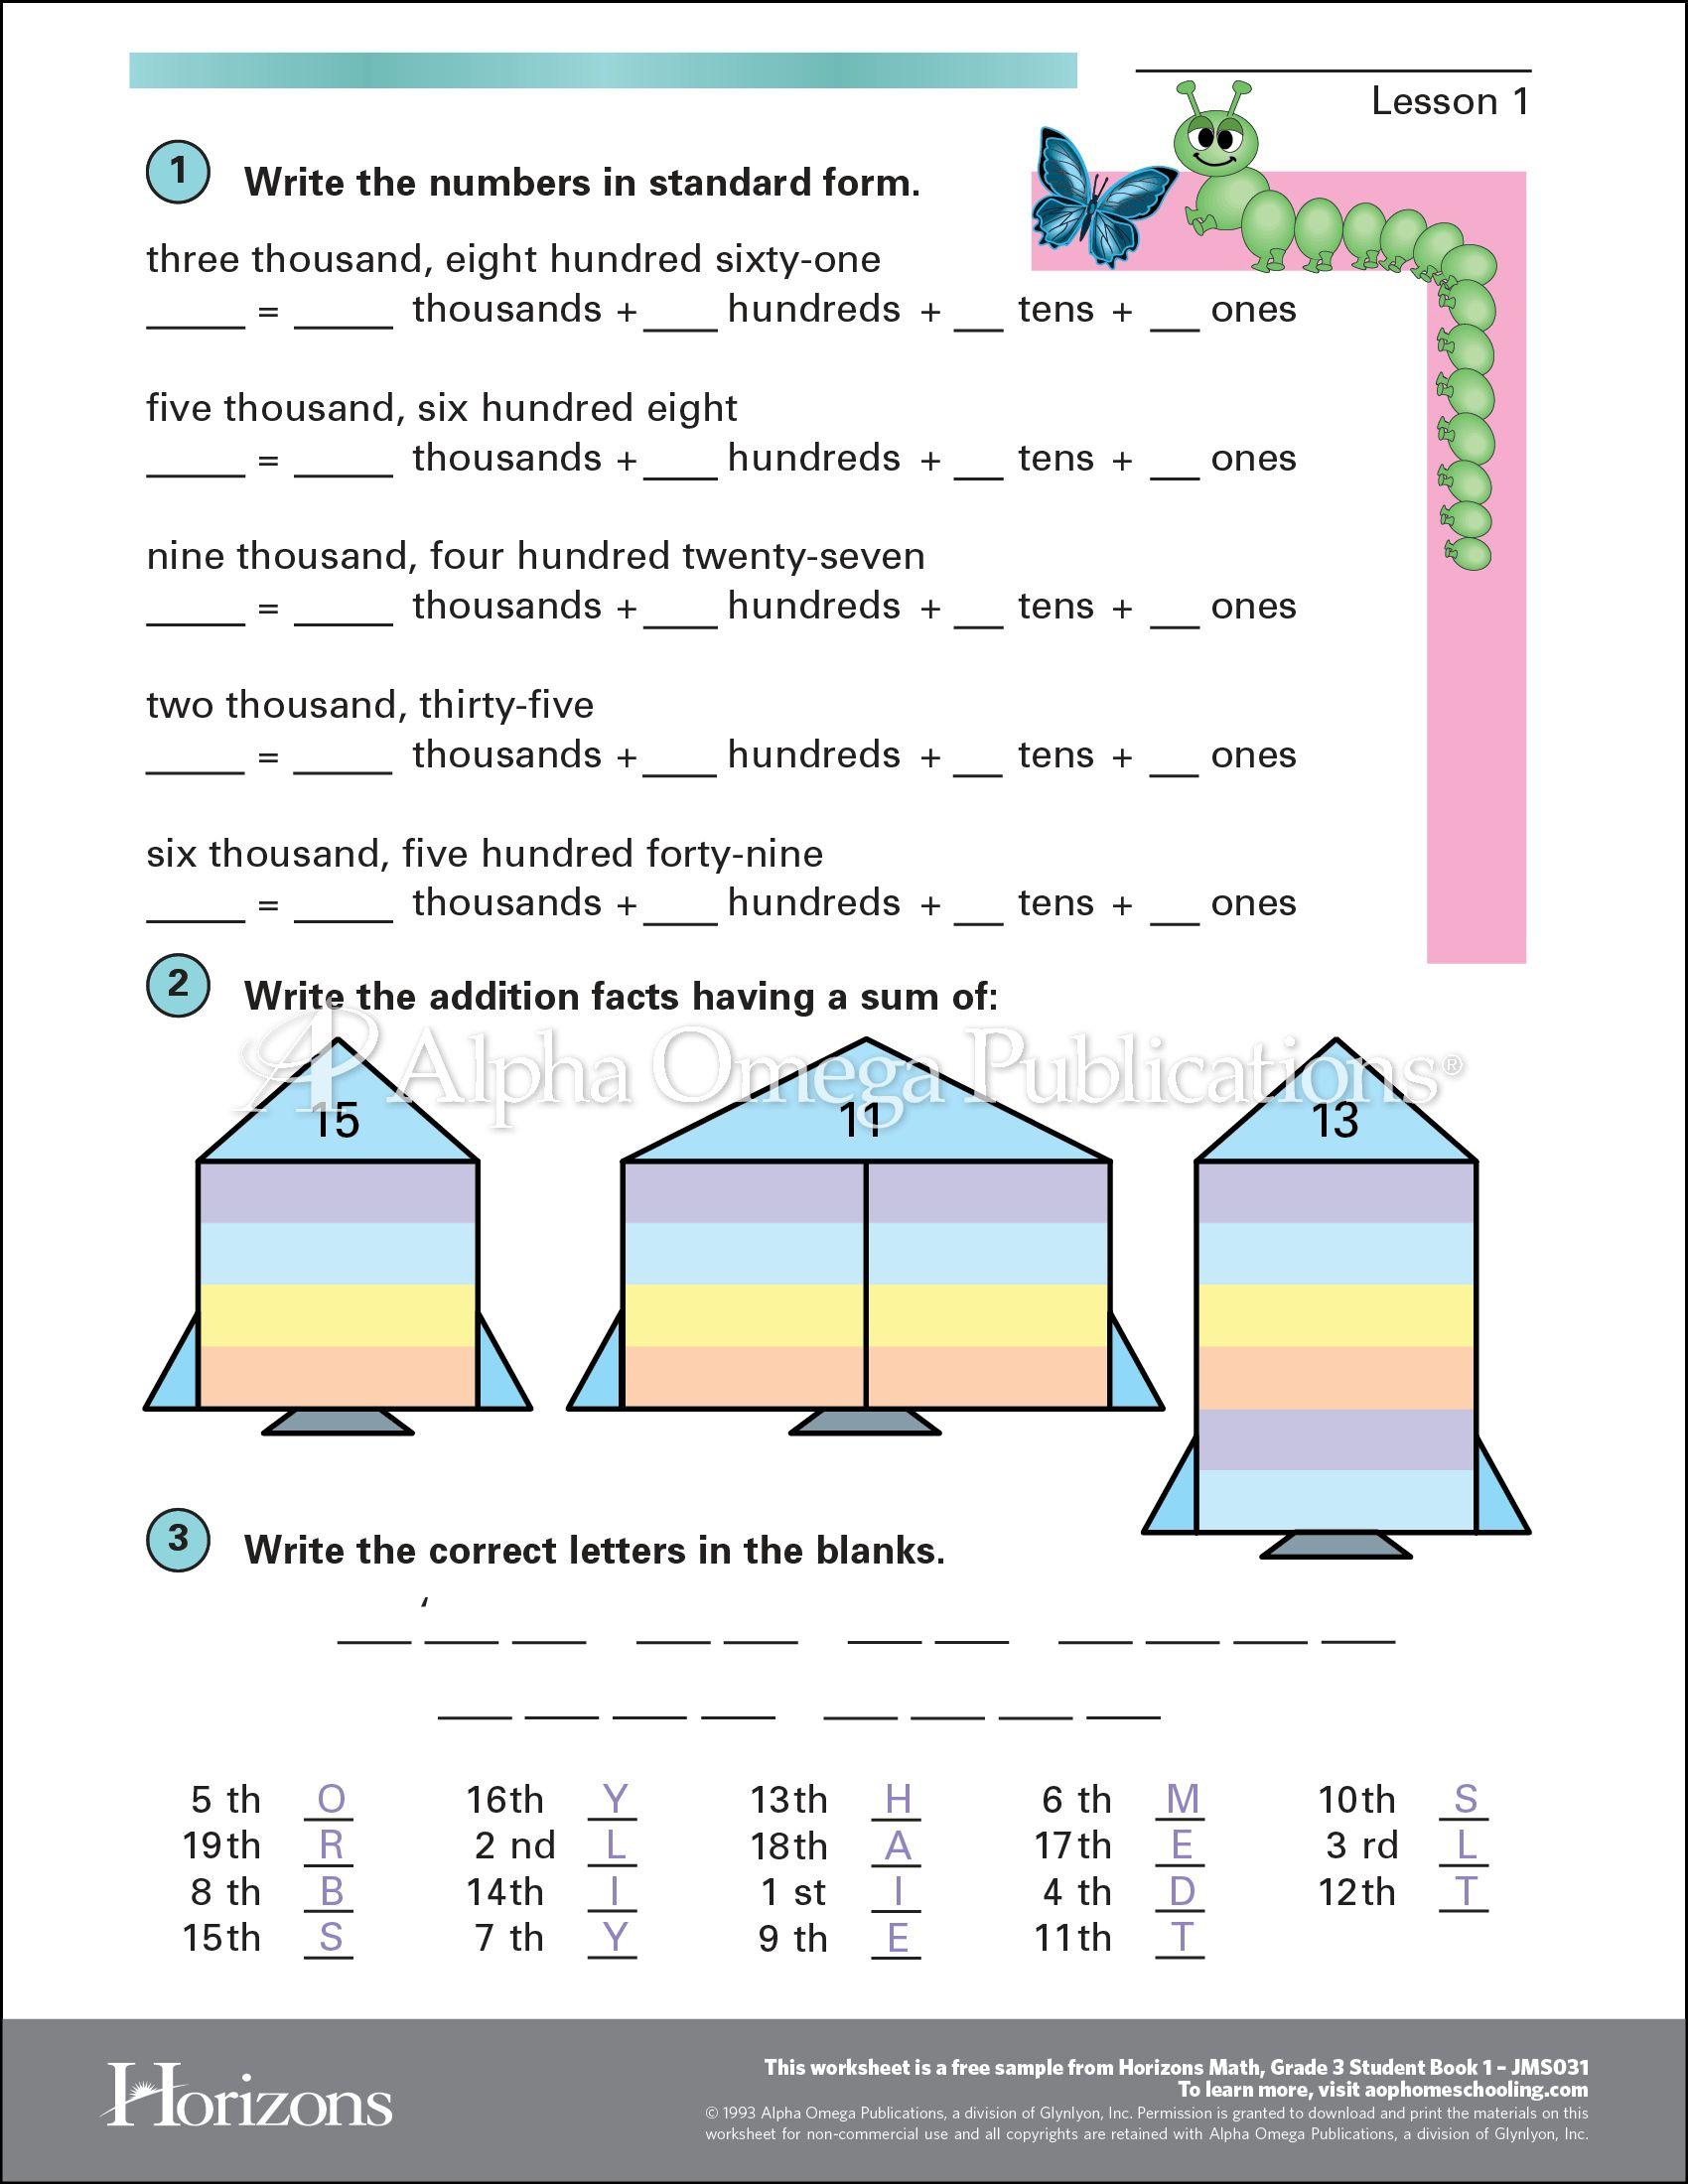 Aop Horizons Free Printable Worksheet Sample Page Download